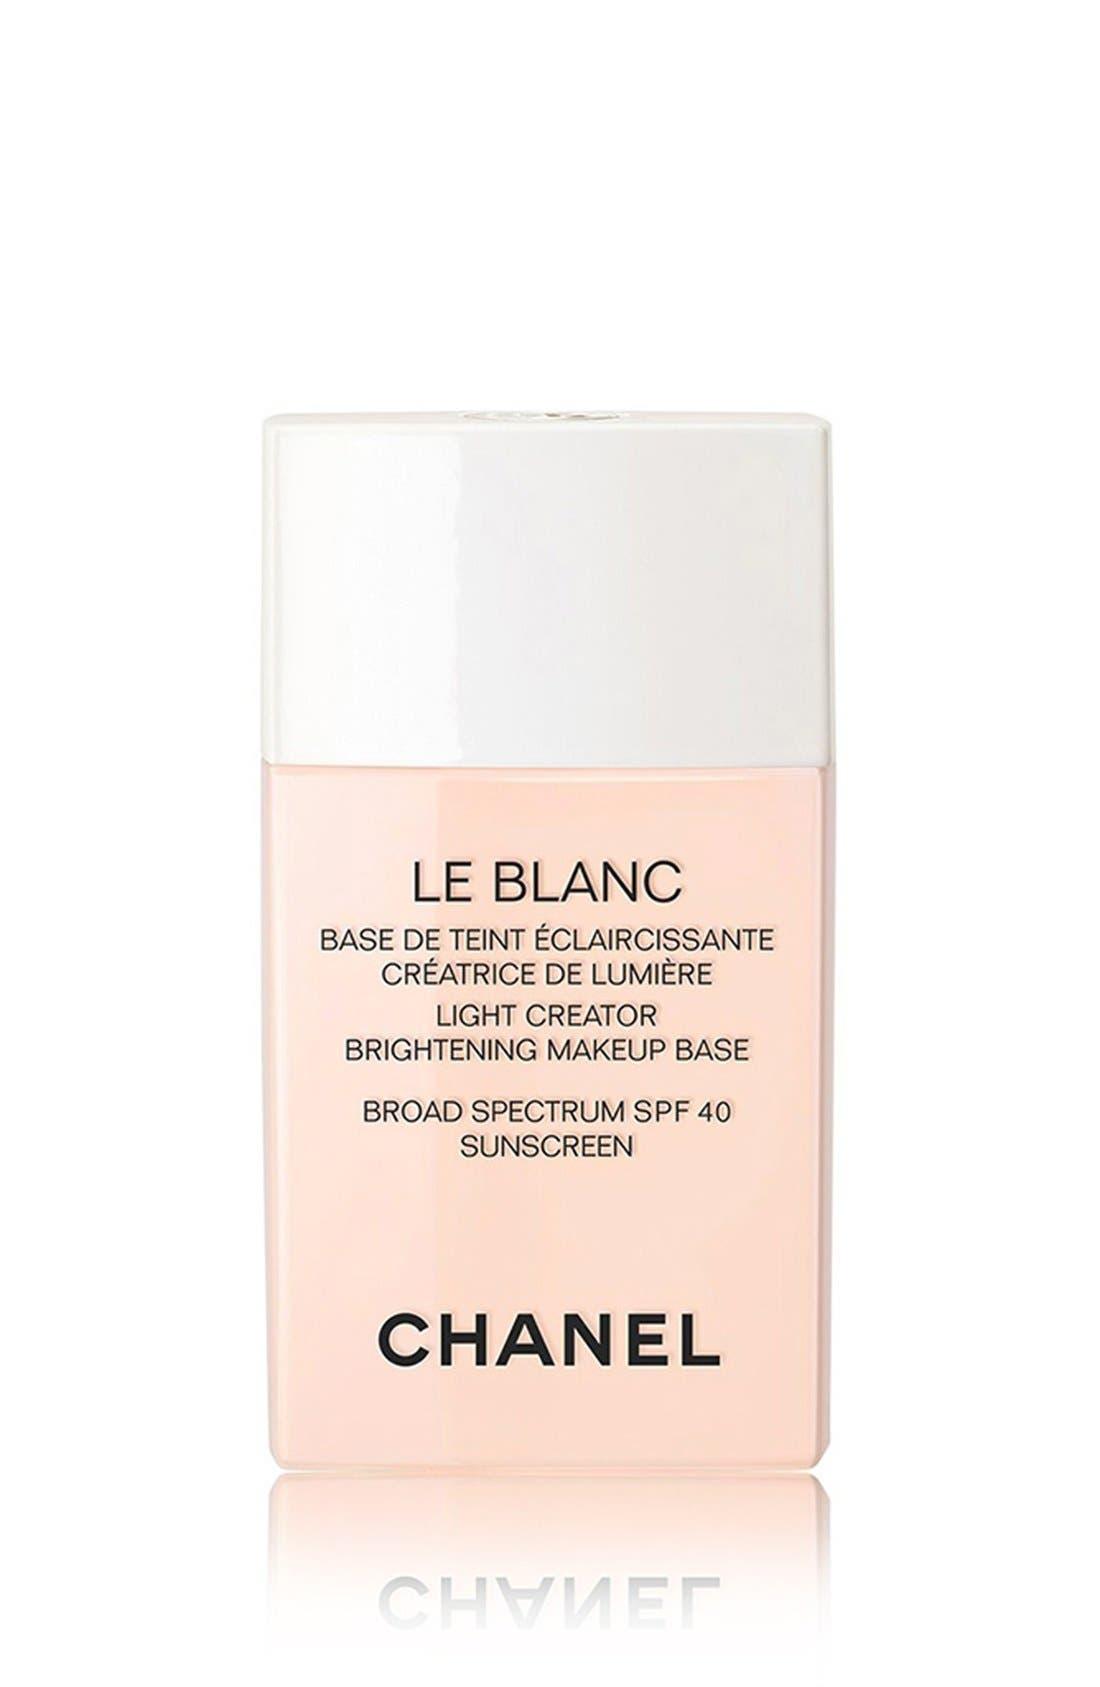 LE BLANC LIGHT CREATOR <br />Brightening Makeup Base Broad Spectrum SPF 40 Sunscreen, Main, color, ROSE